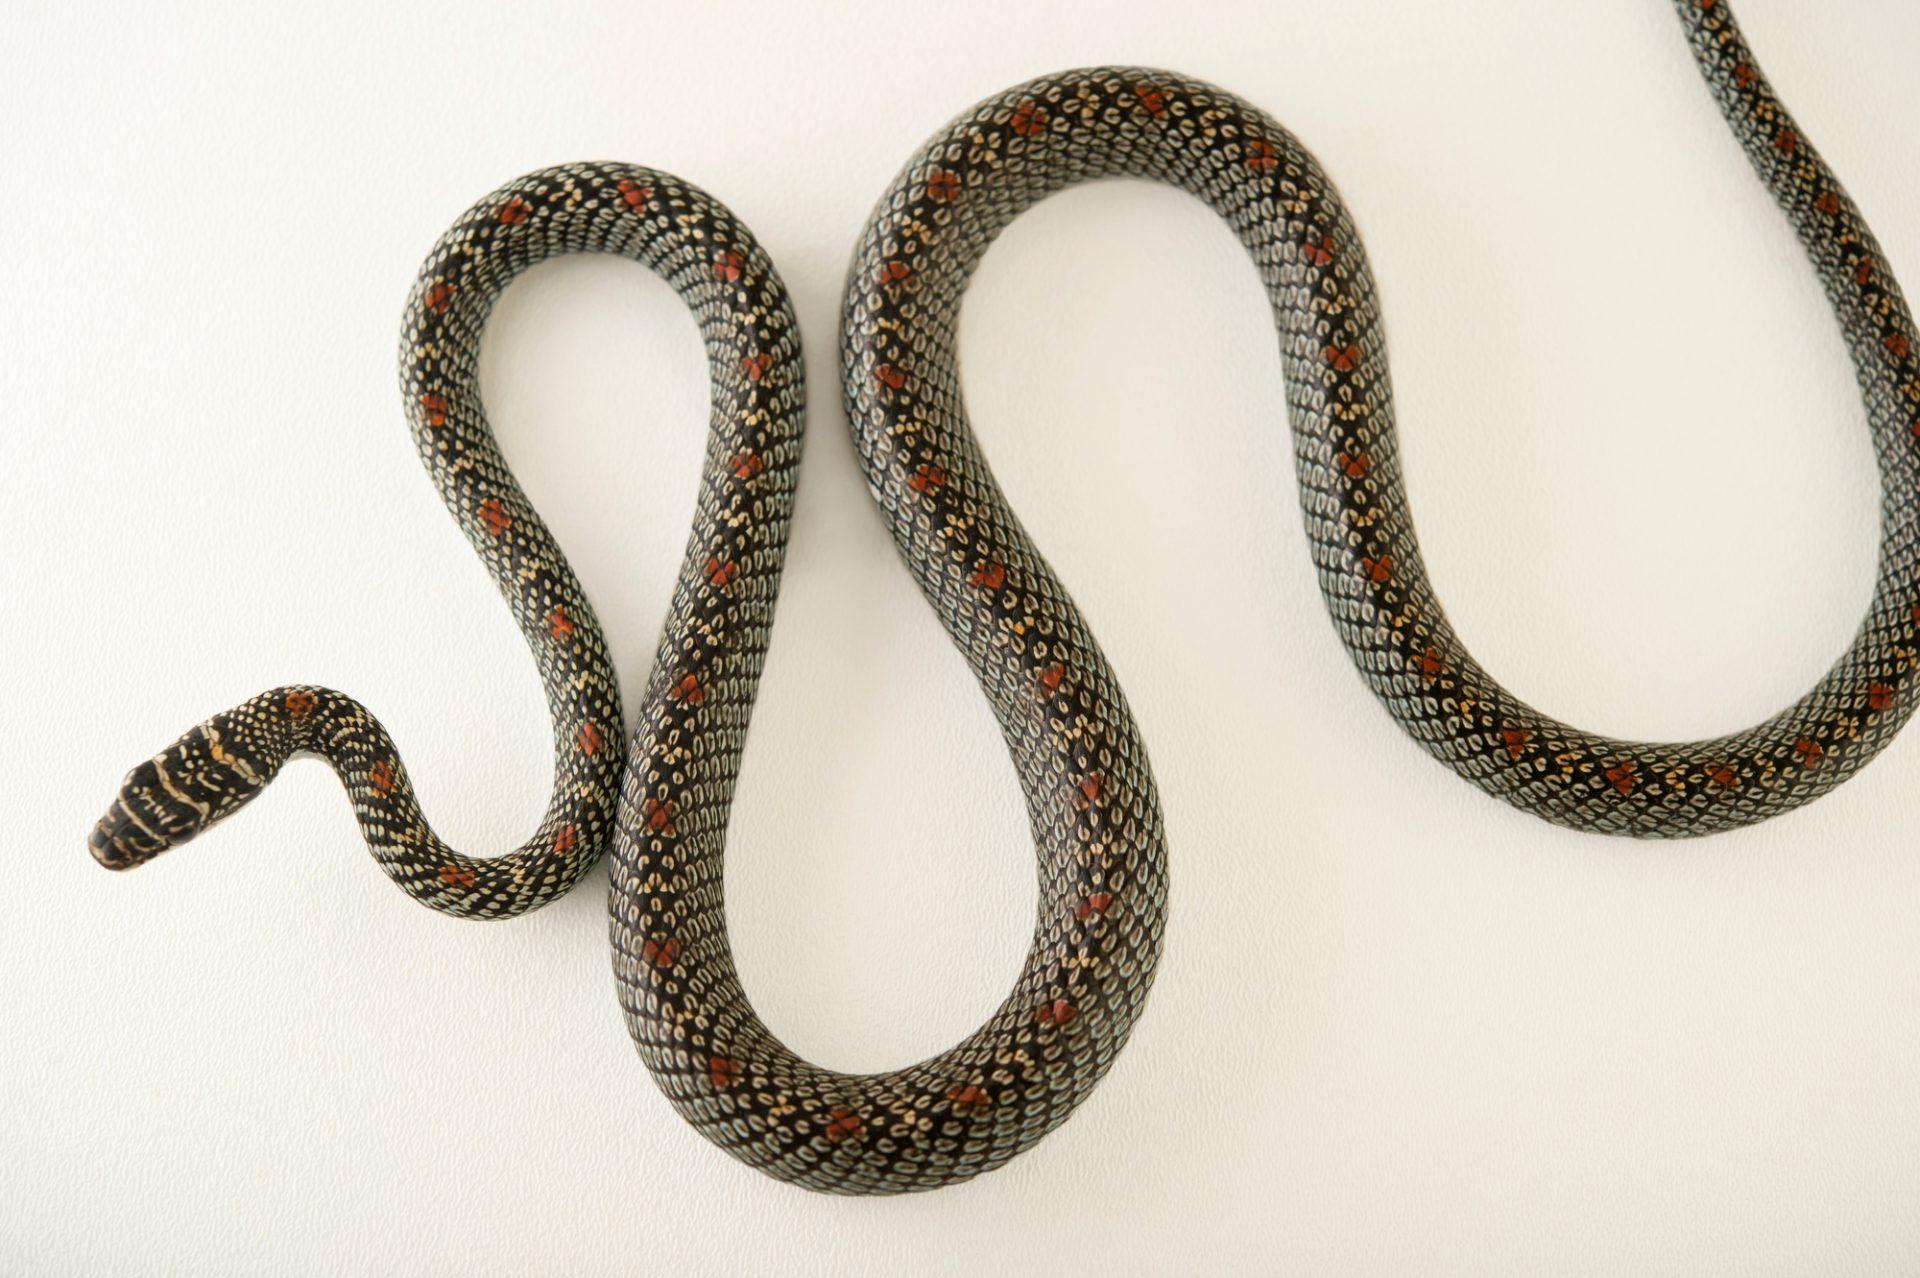 Photo: An ornate flying snake, Chrysopelea ornata ornatissima, at the Assam State Zoo cum Botanical Garden in Guwahati, Assam, India.